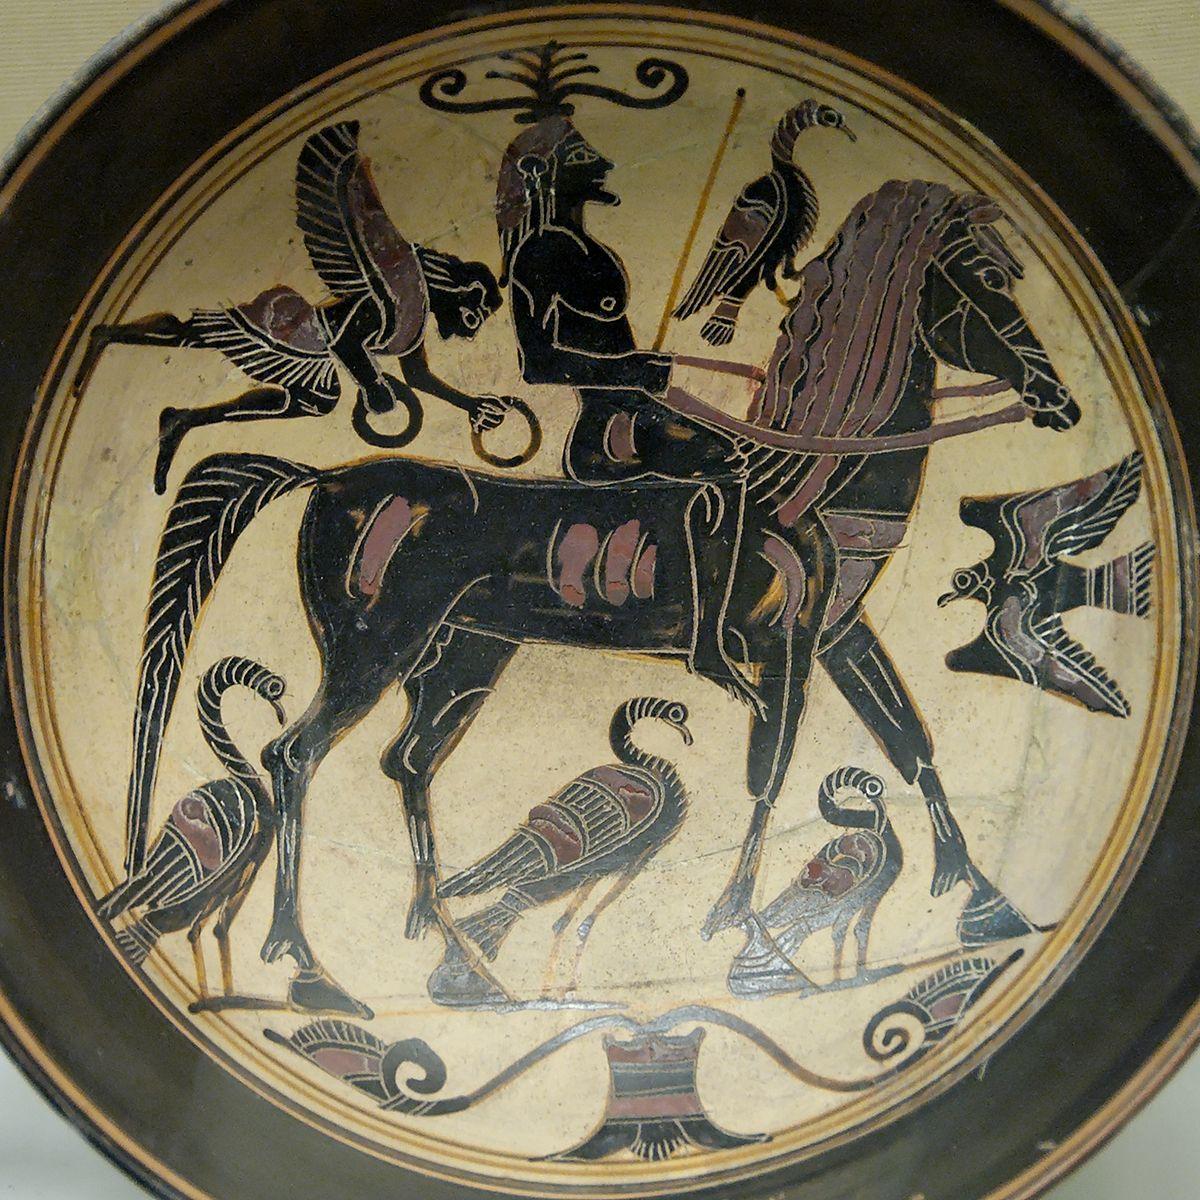 https://upload.wikimedia.org/wikipedia/commons/thumb/a/a9/Rider_BM_B1.jpg/1200px-Rider_BM_B1.jpg